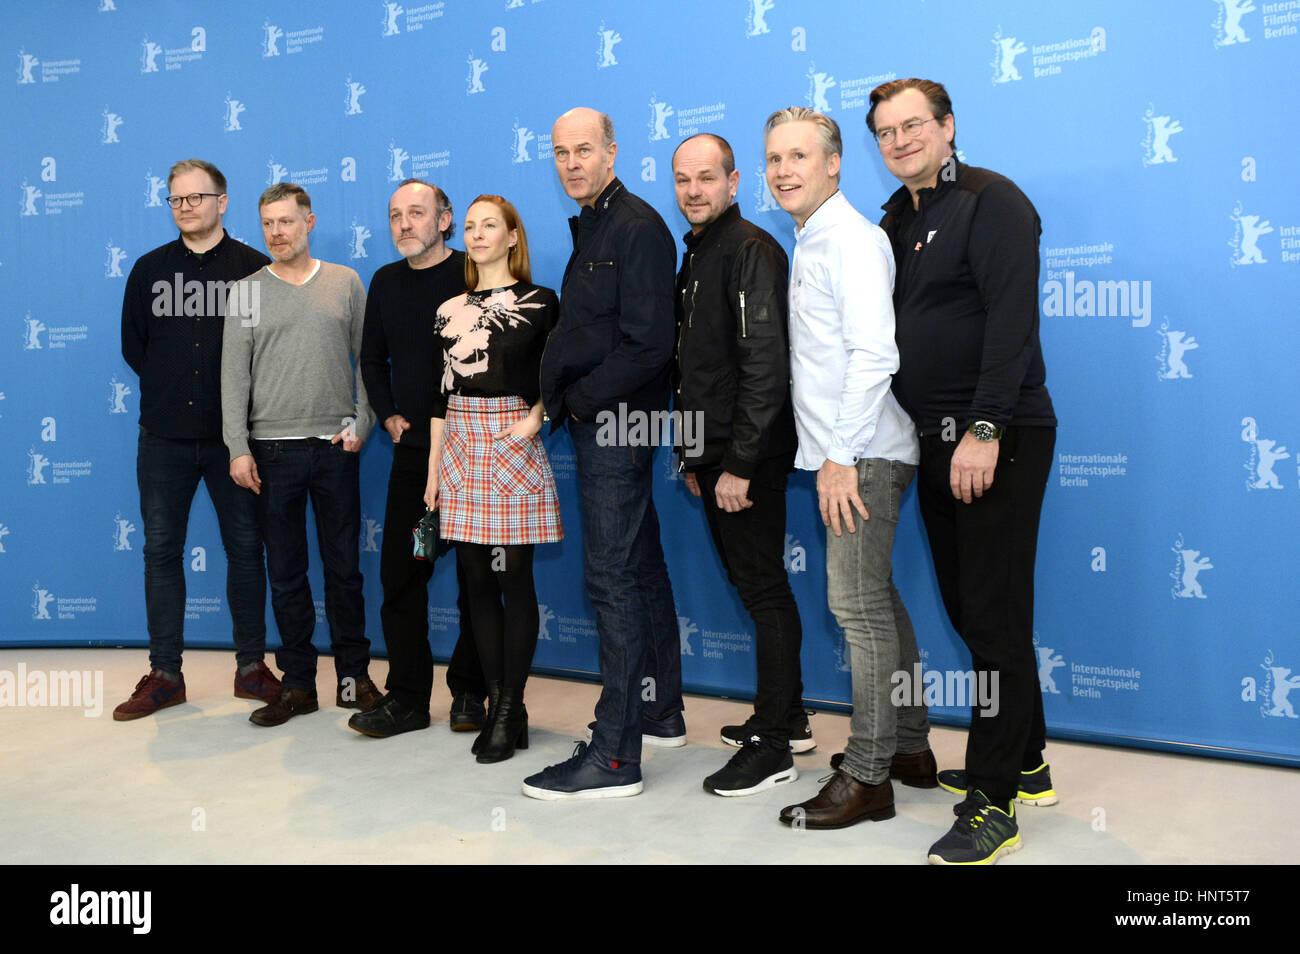 Berlin, Germany. 16th Feb, 2017. Jan Trygve Røyneland, Andreas Lust, Karl Markovics, Katharina Schüttler, - Stock Image